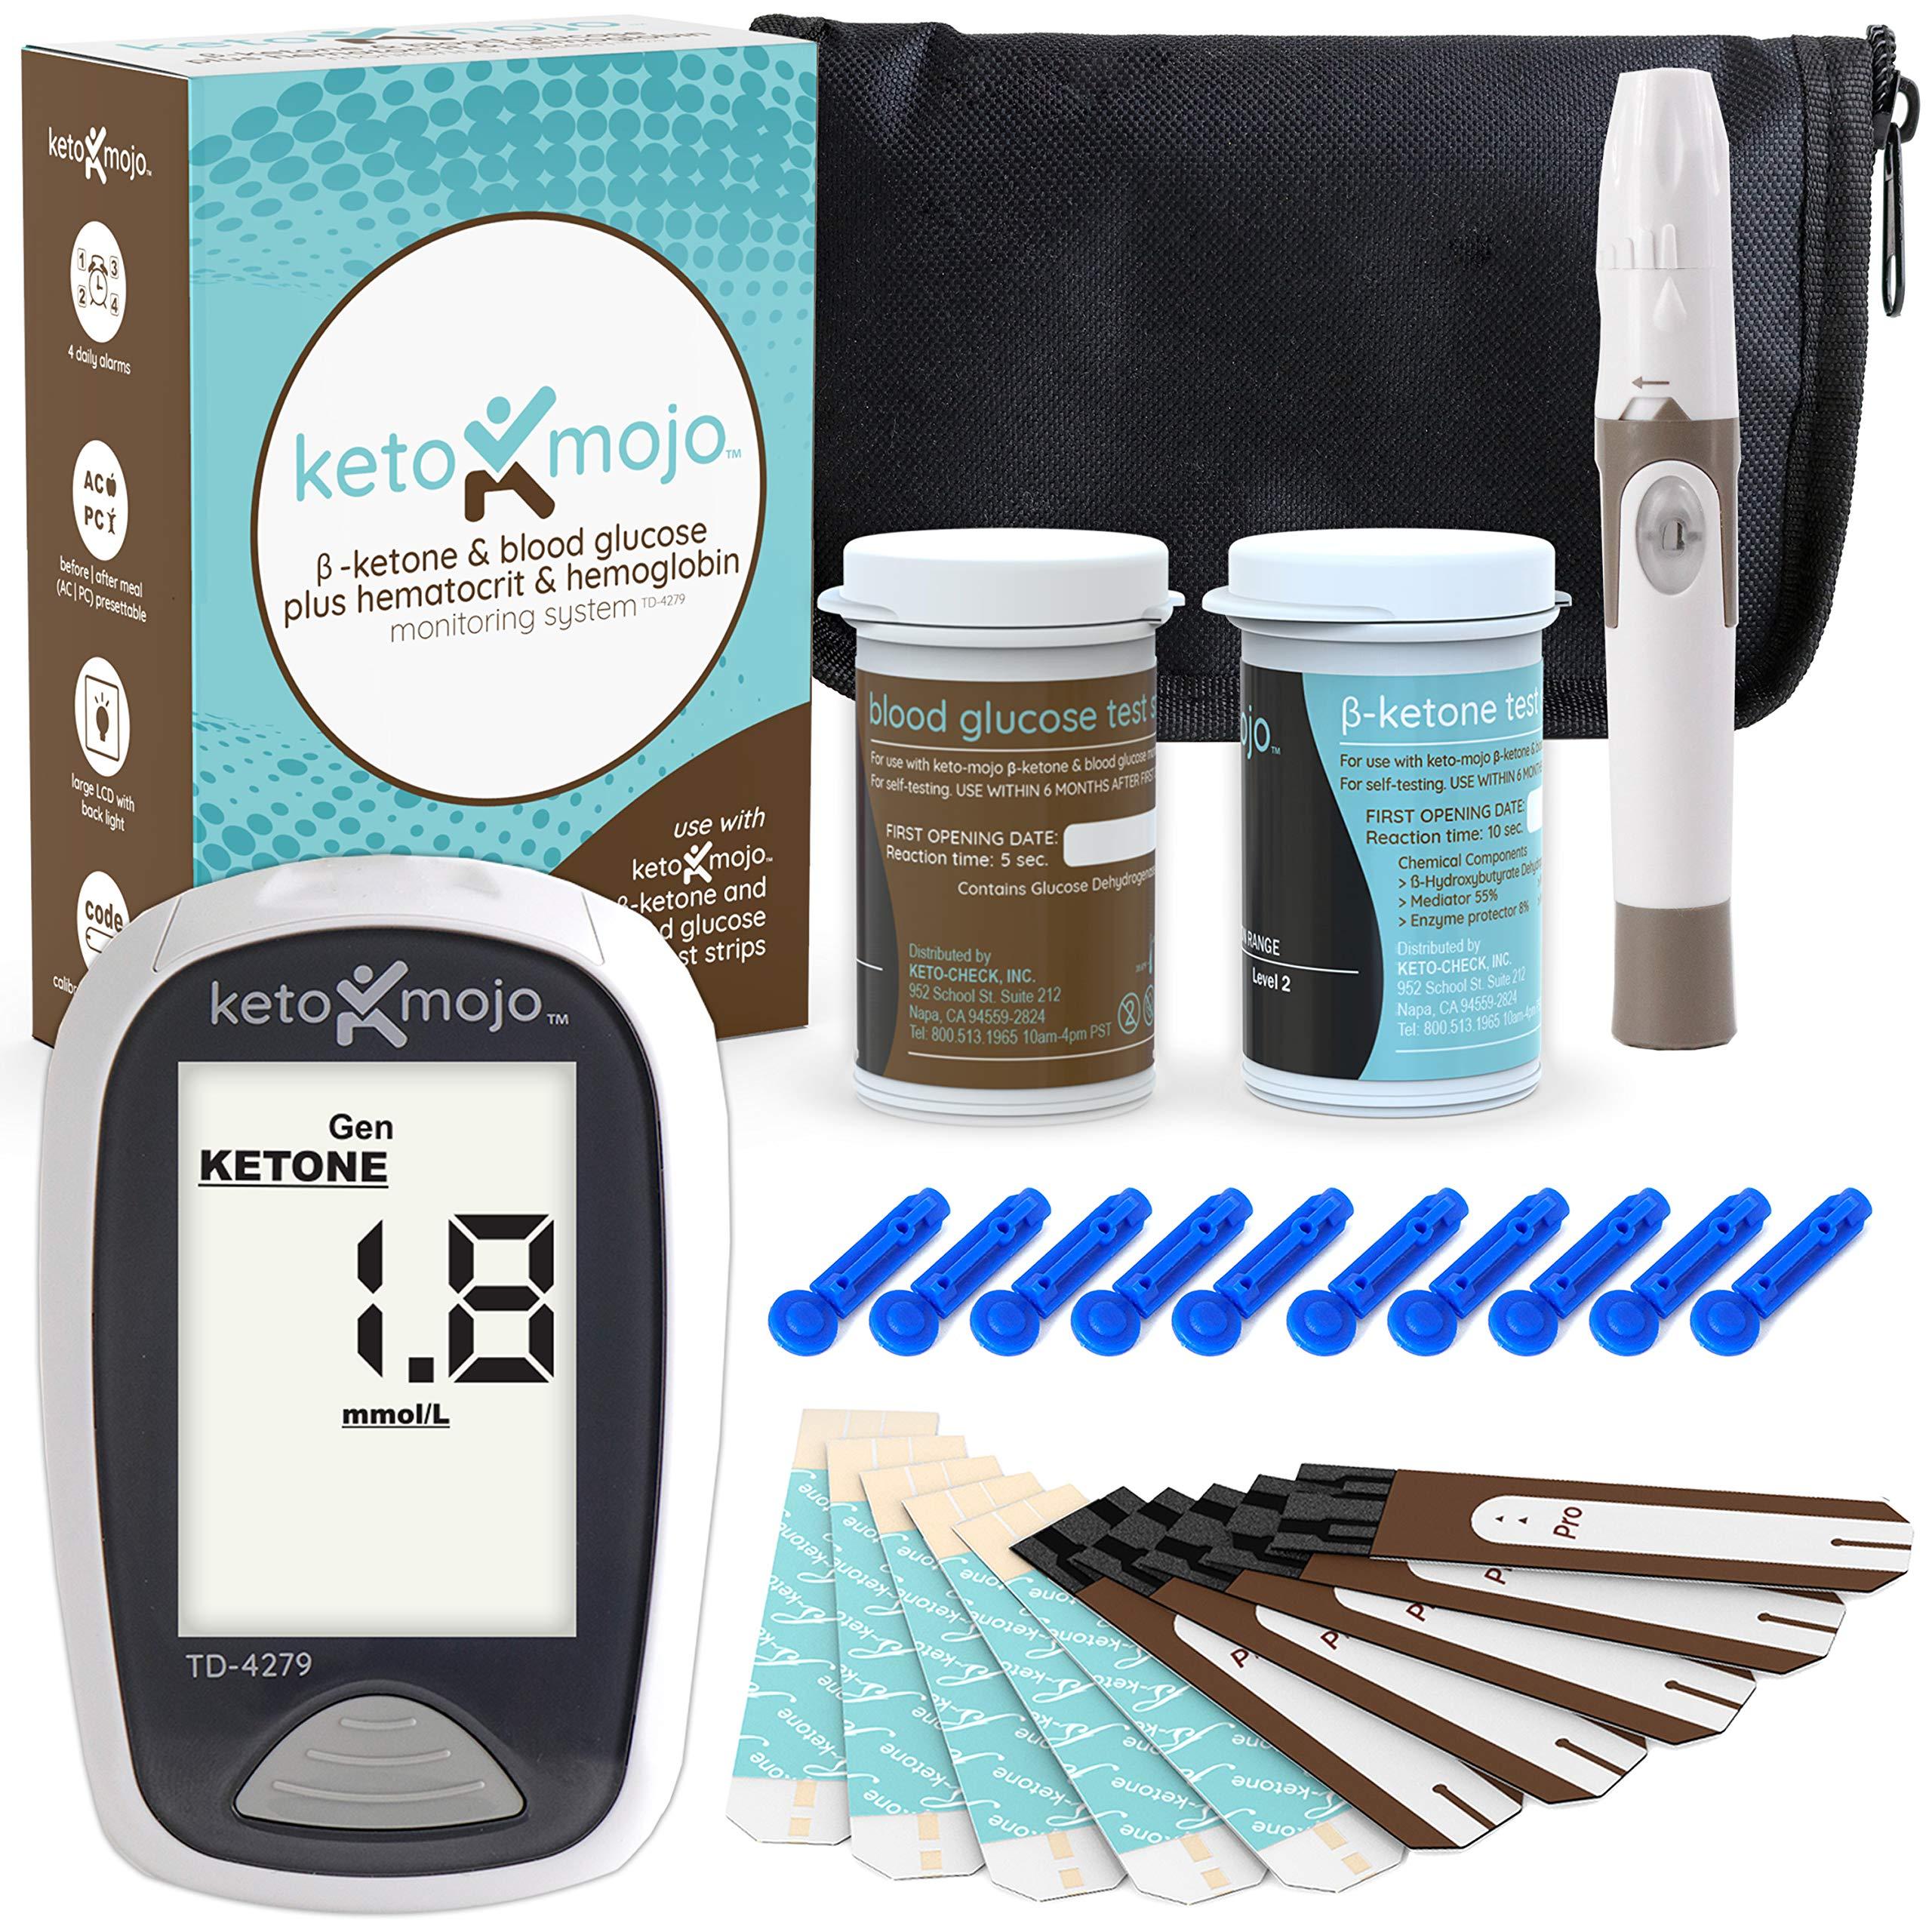 KETO-MOJO Blood Ketone and Glucose Testing Kit, 1 Meter, 10 Ketone & 10 Glucose Test Strips,1 Lancing Device, 10 Lancets, Monitor Your Ketogenic Diet by KETO MOJO